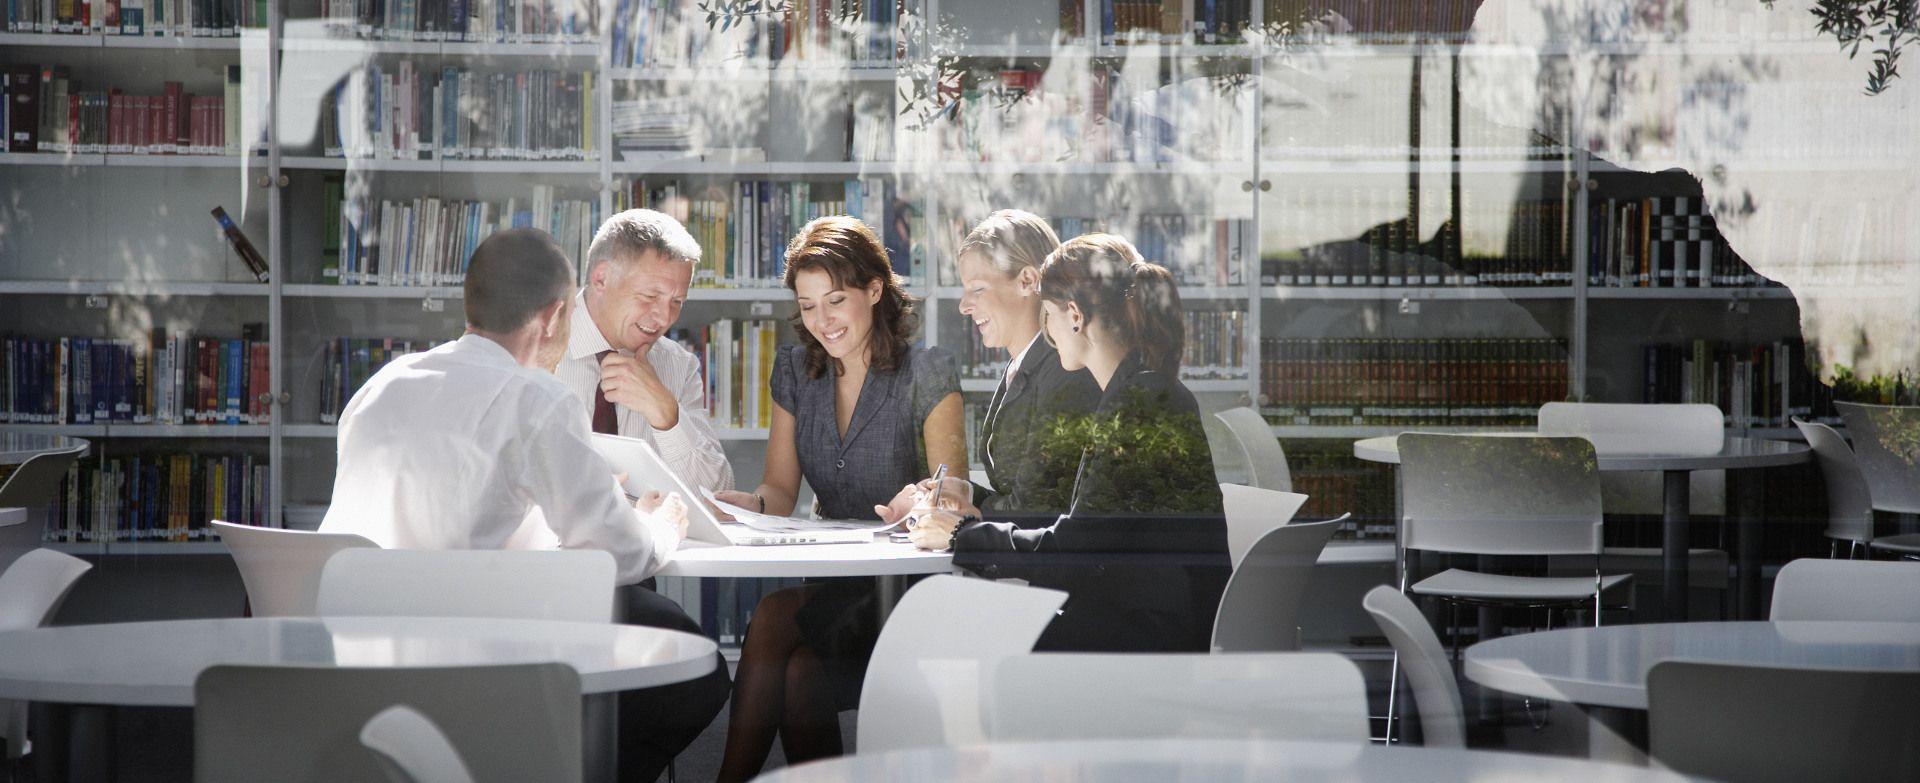 Image-Picture-People-Office-Meeting-Books-2016-SAP-GLOBAL-EN